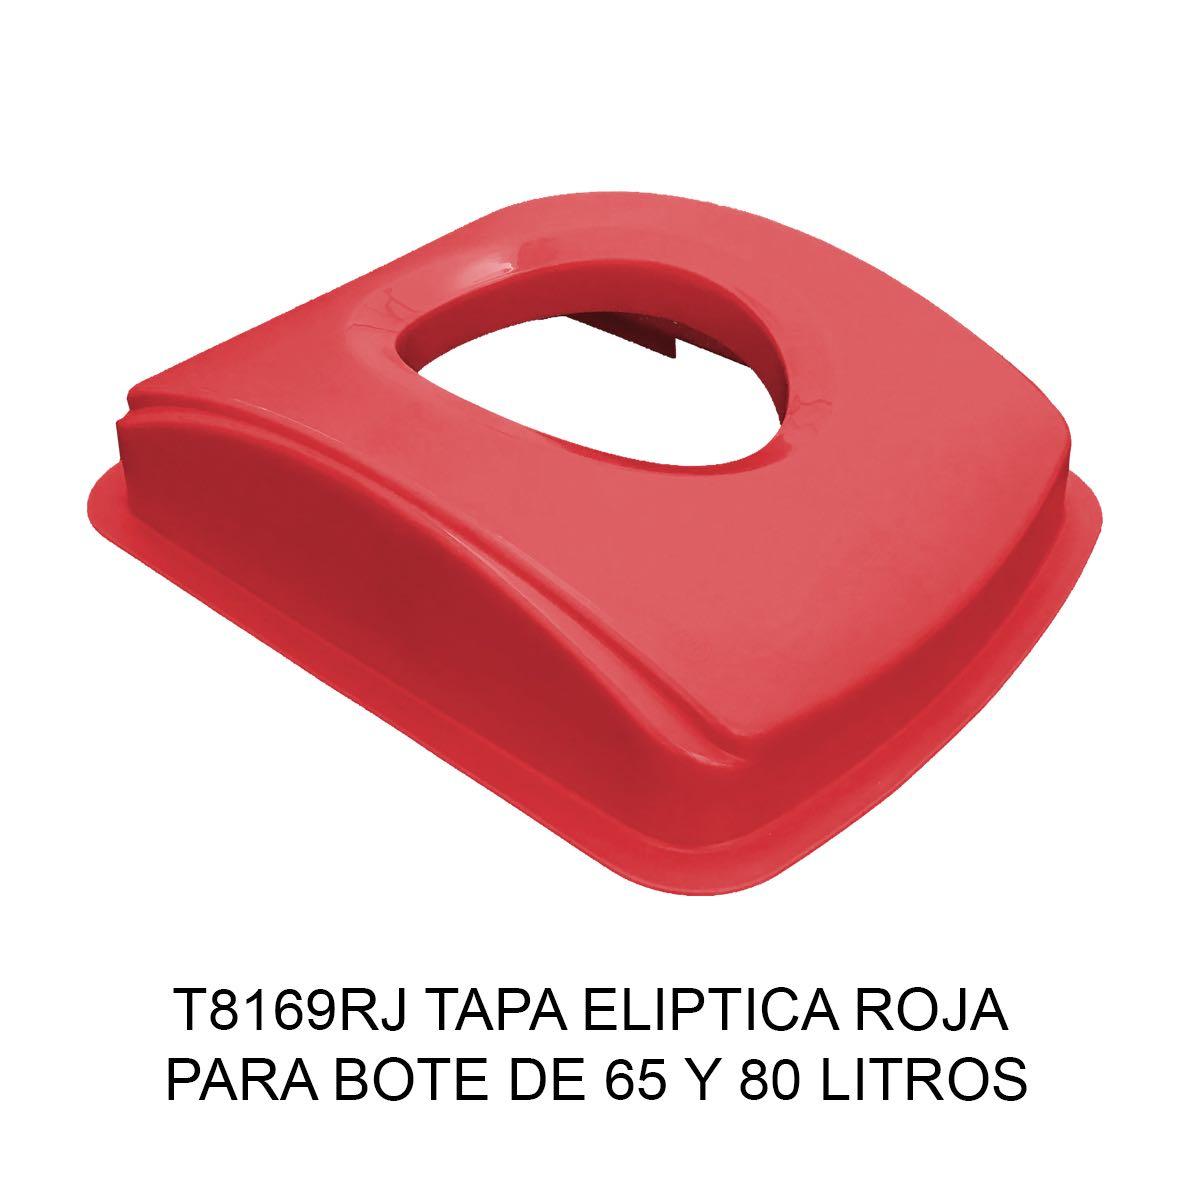 Tapa elíptica para bote de basura color rojo para botes de 65 y 80 litros Modelo T8169RJ de Sablón